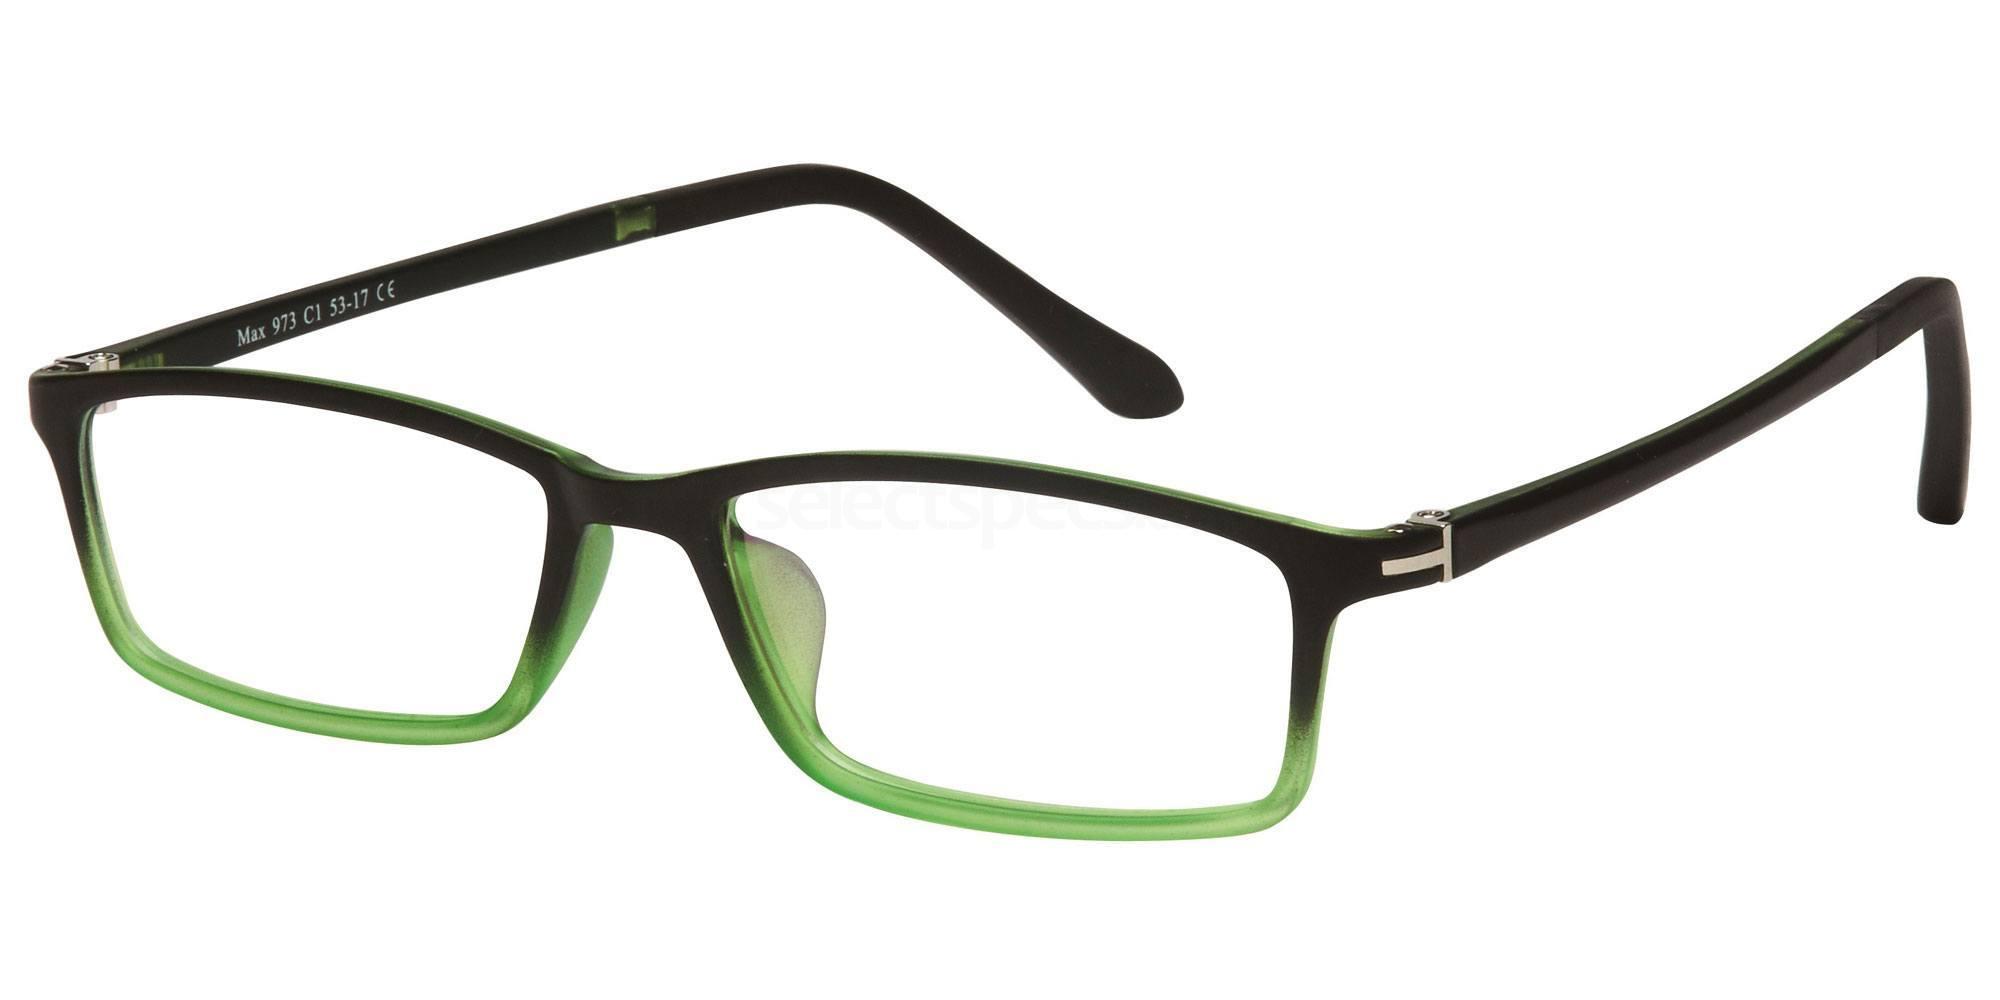 C1 M973 Glasses, Max Eyewear